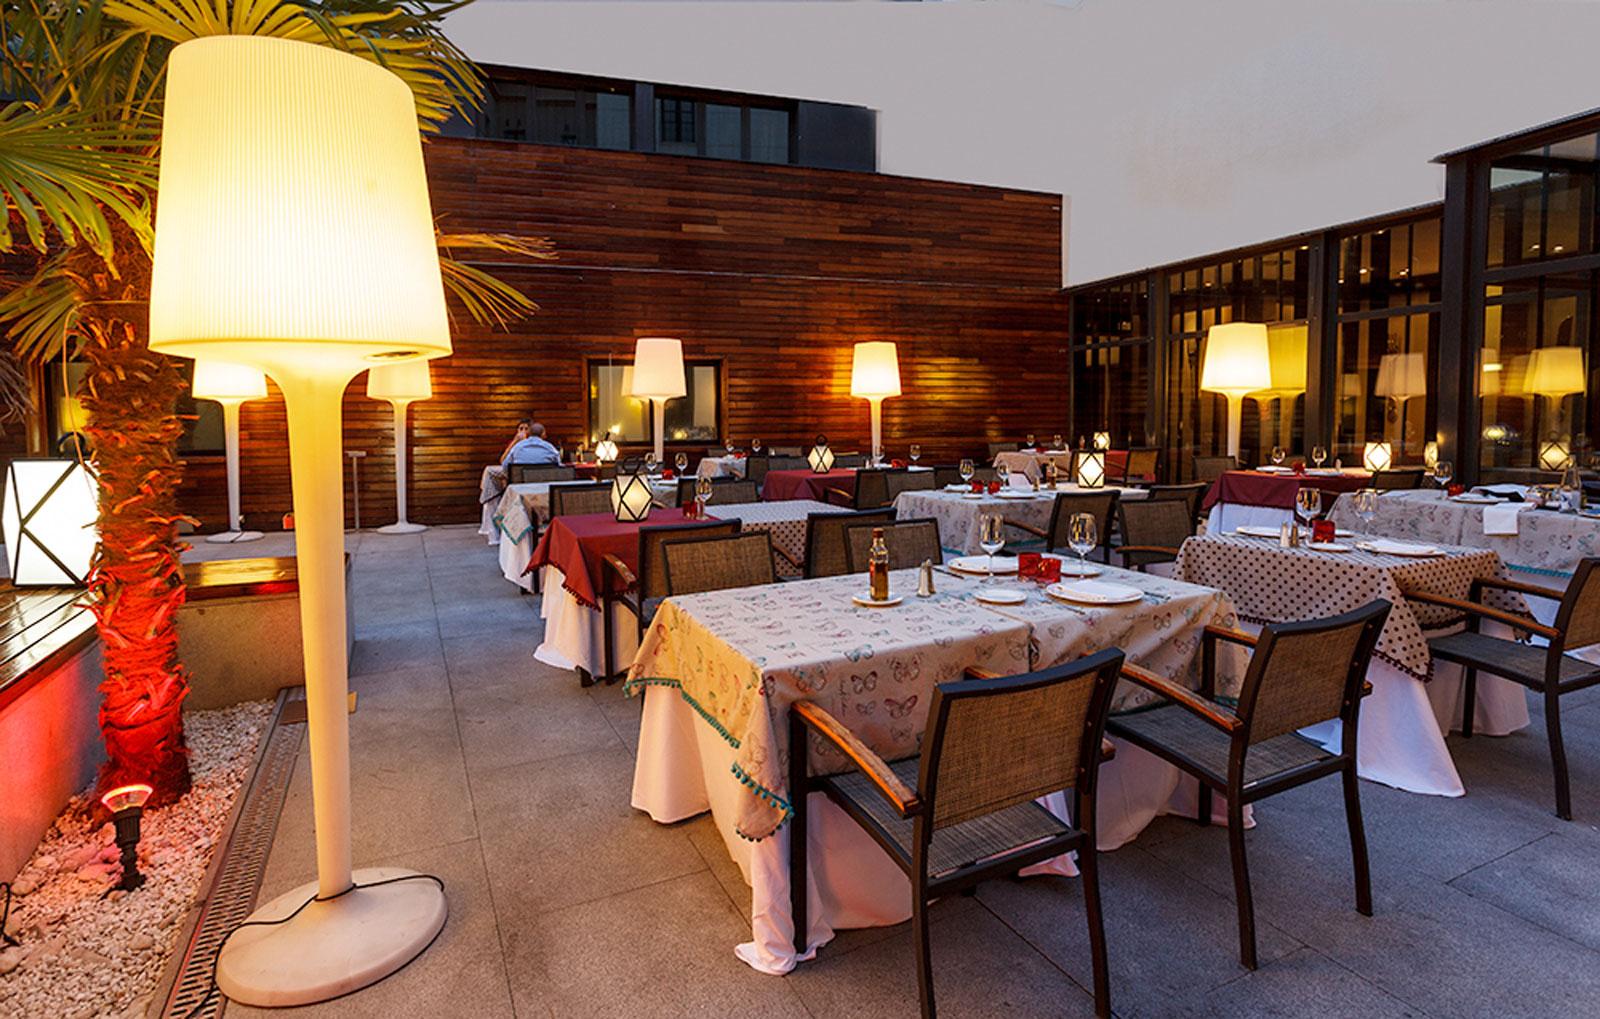 Services Hotel Madrid Soho - Vincci Hotels - La Terraza Prado 18